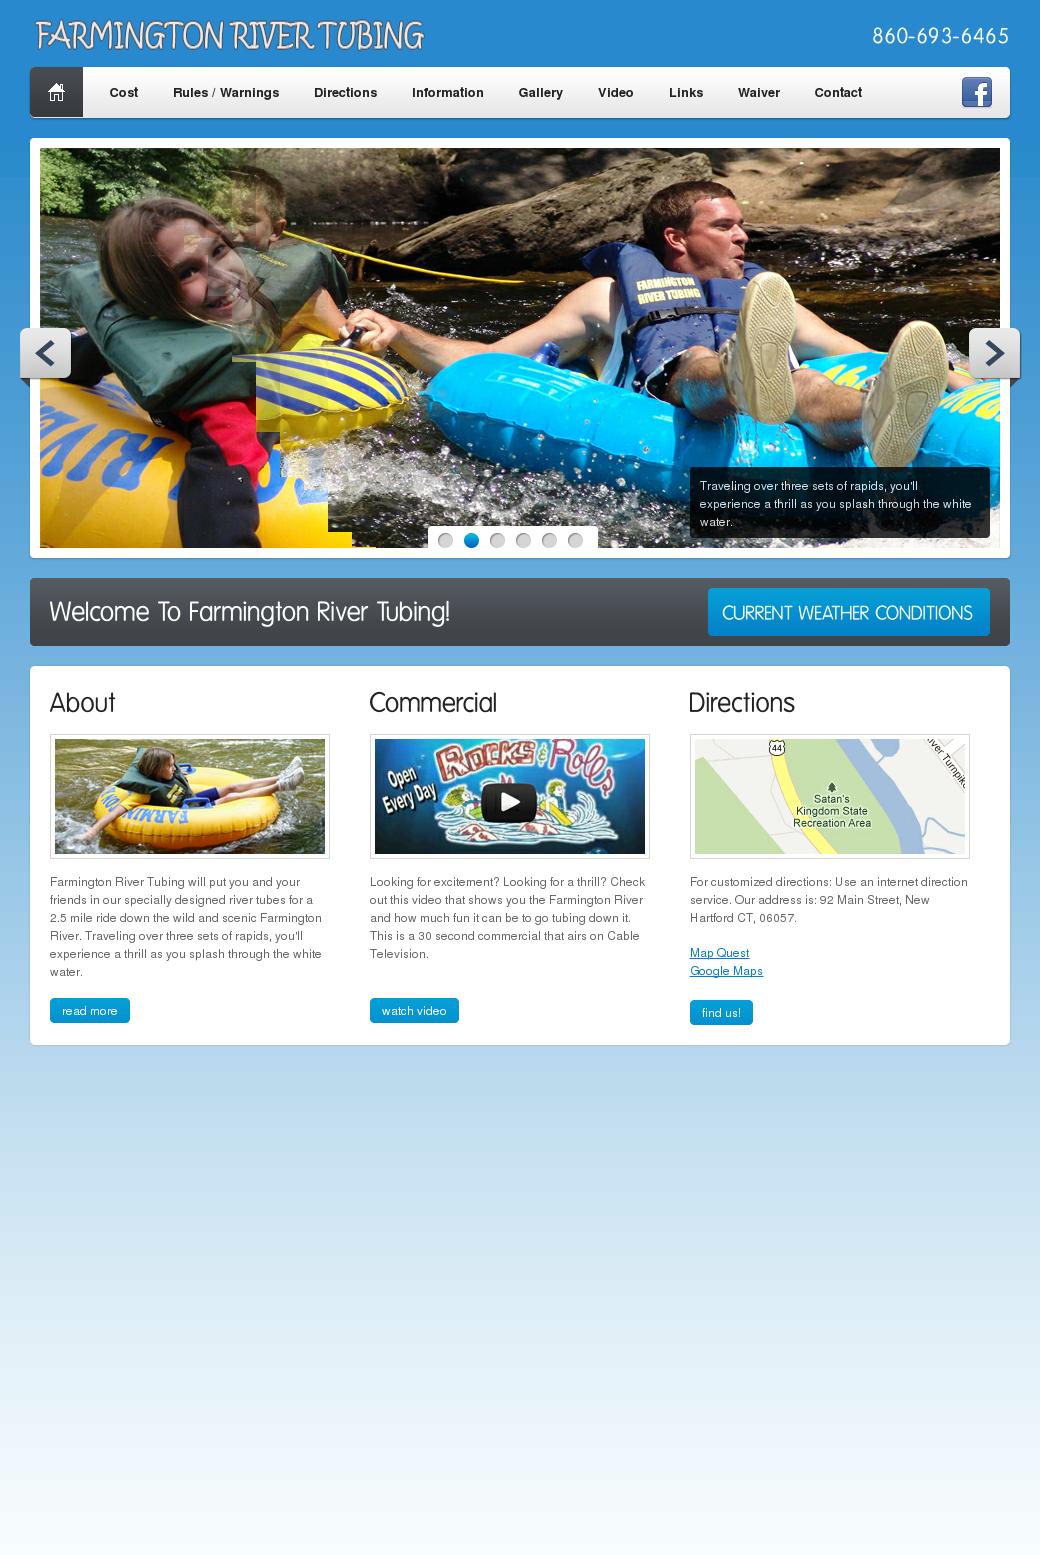 Farmington River Tubing Competitors, Revenue and Employees